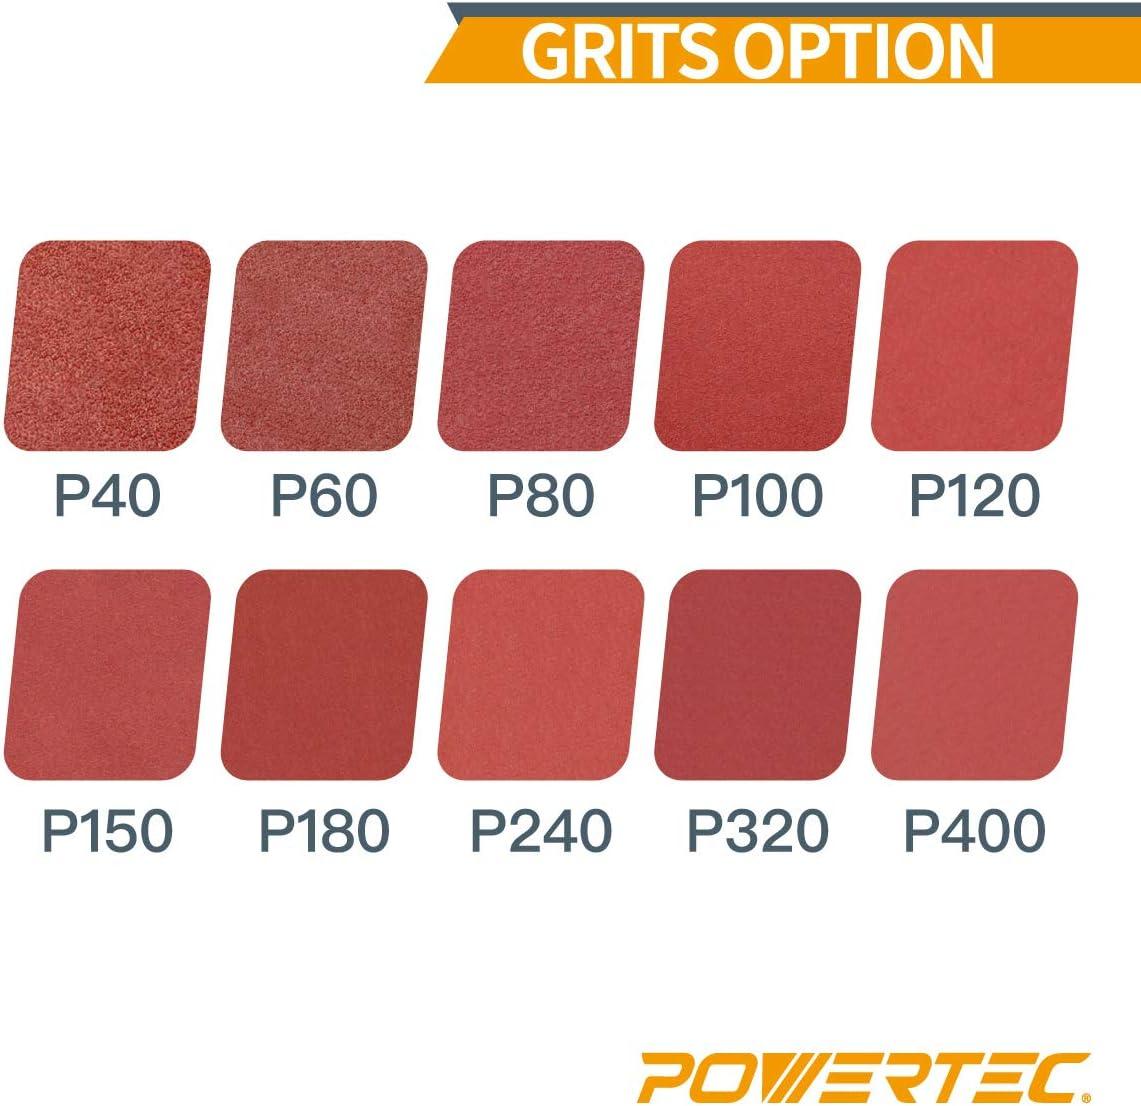 10-Pack POWERTEC 110090 4-Inch x 24-Inch 80 Grit Aluminum Oxide Sanding Belt